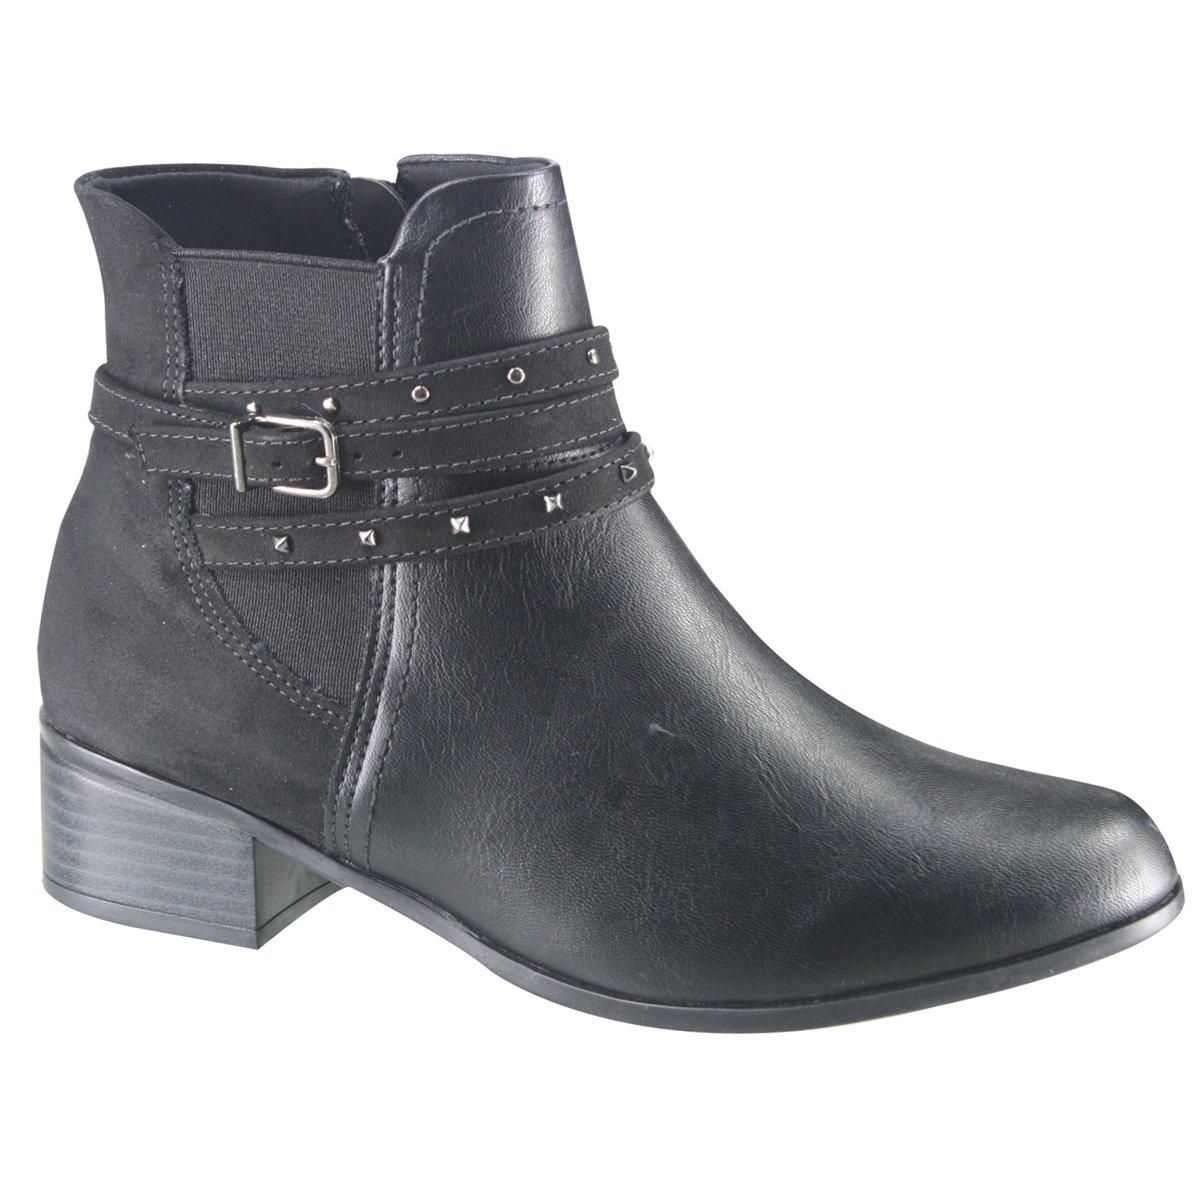 eb4e05fcb Amplie a imagem. Bota Feminina Ankle Boot Comfortflex; Bota Feminina Ankle  Boot Comfortflex 2; Bota Feminina ...